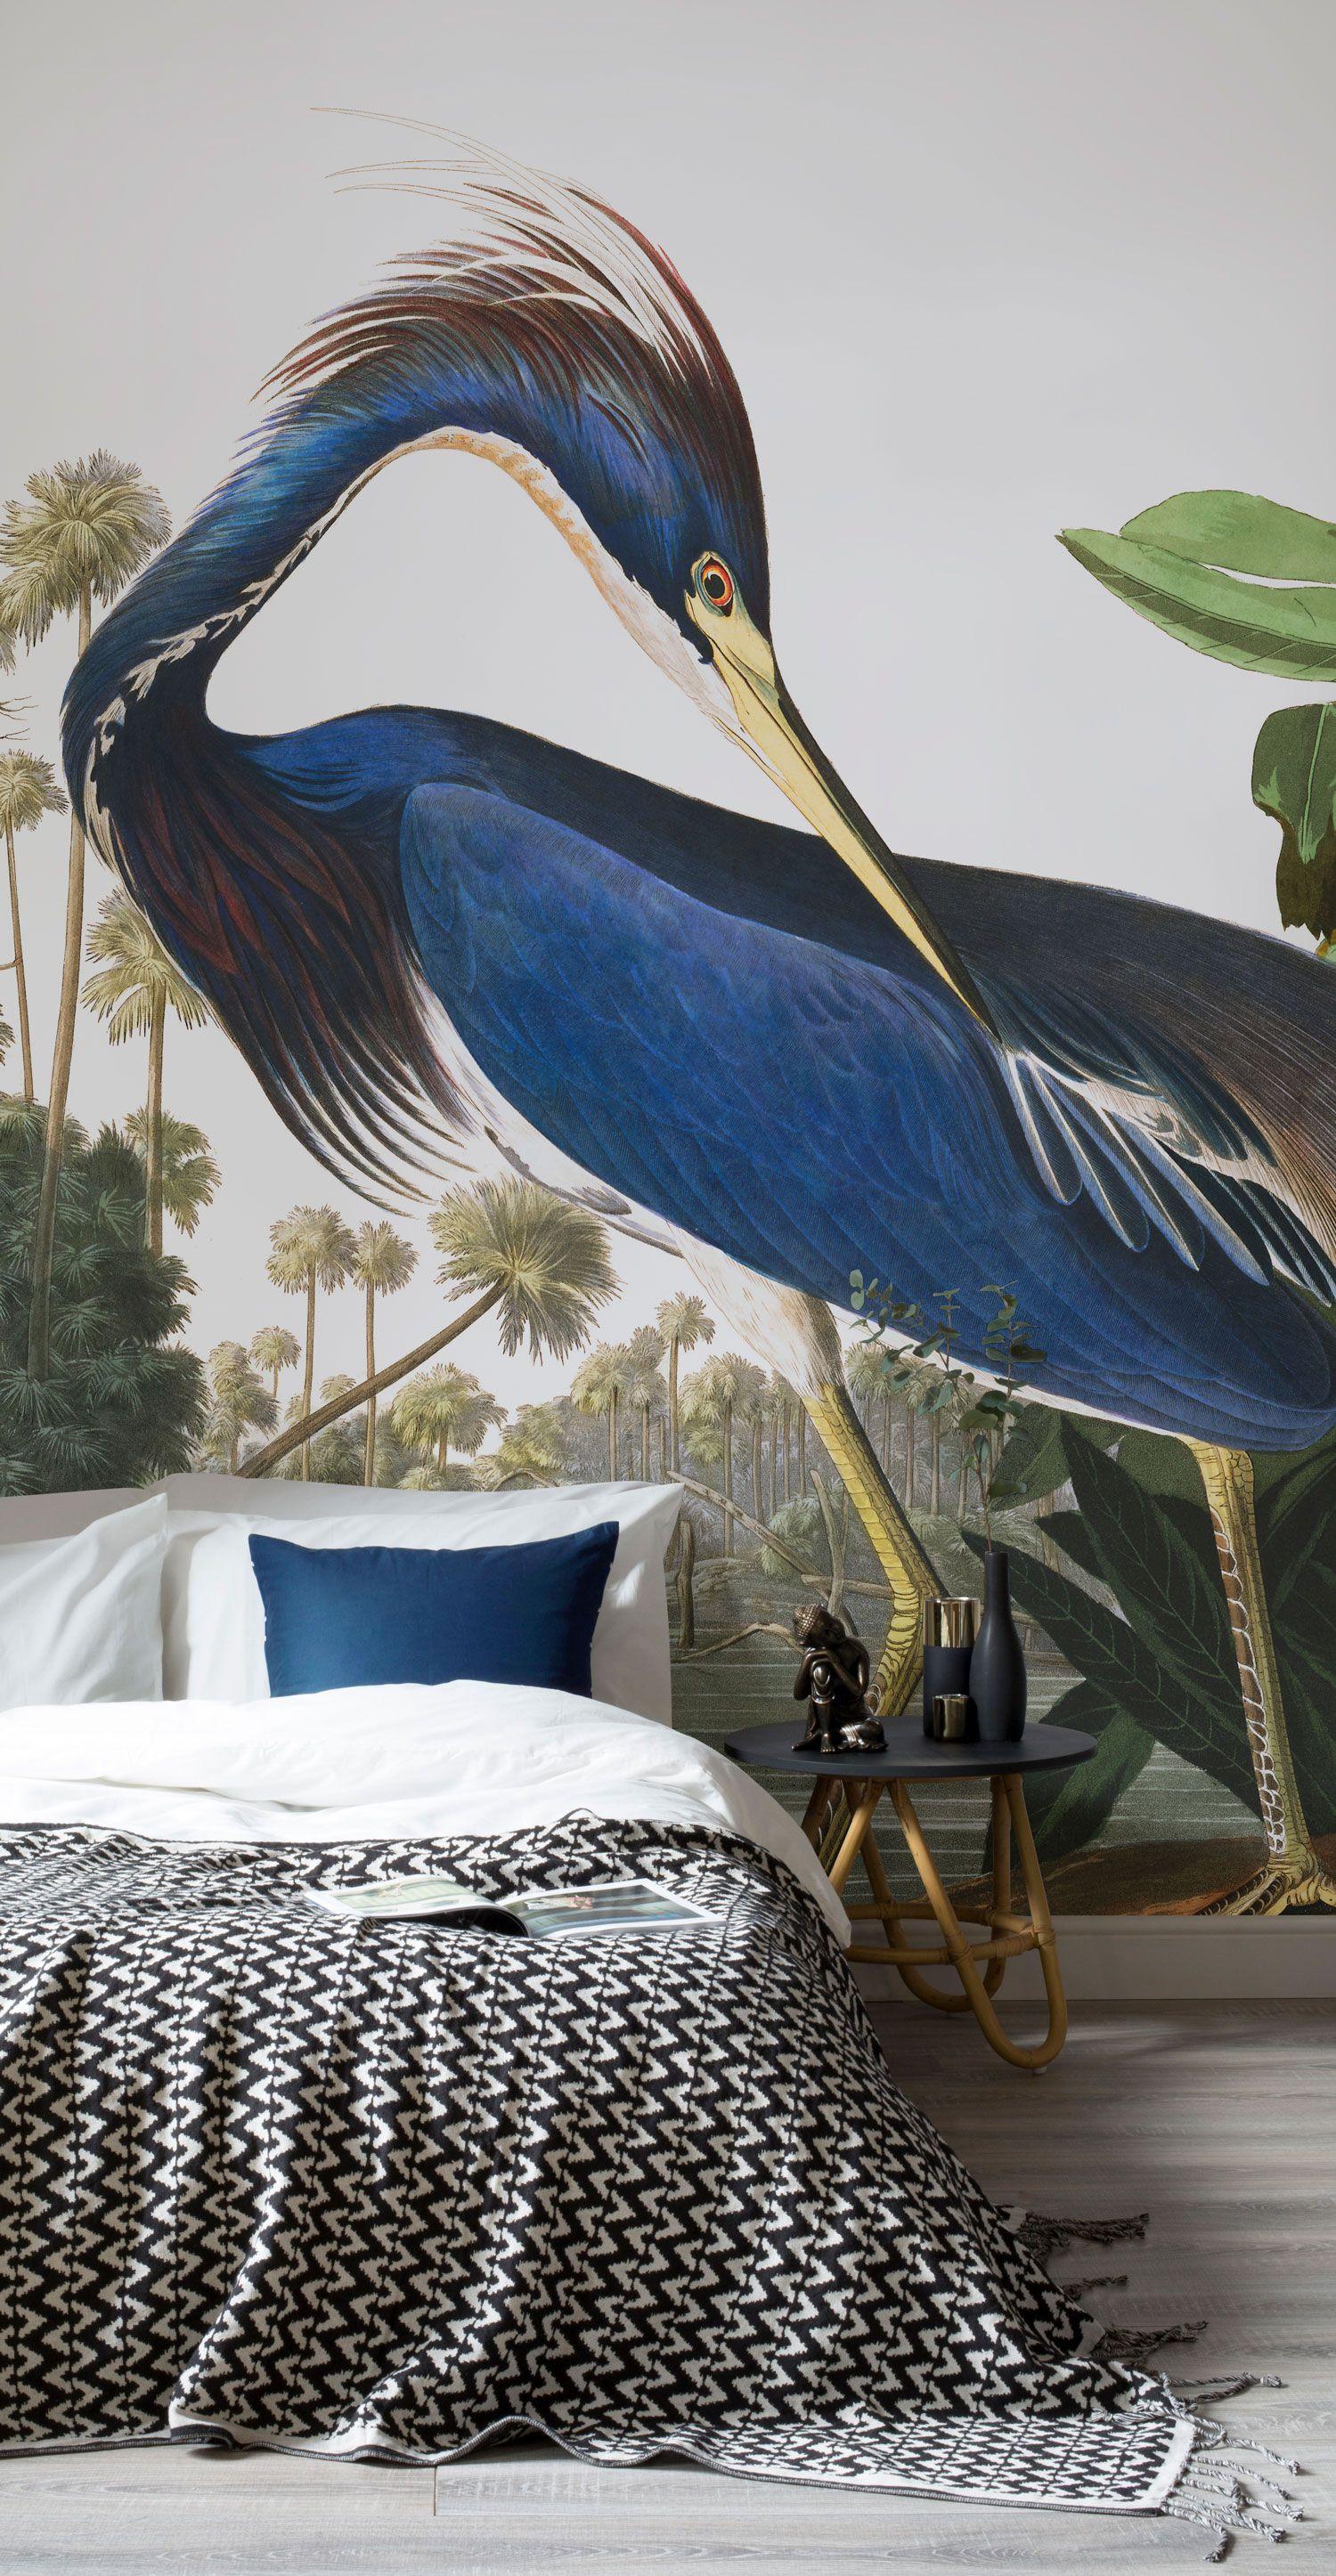 Blue Heron Wallpaper Heron Print Mural Muralswallpaper Bird Wallpaper Bedroom Mural Wallpaper Wallpaper Bedroom